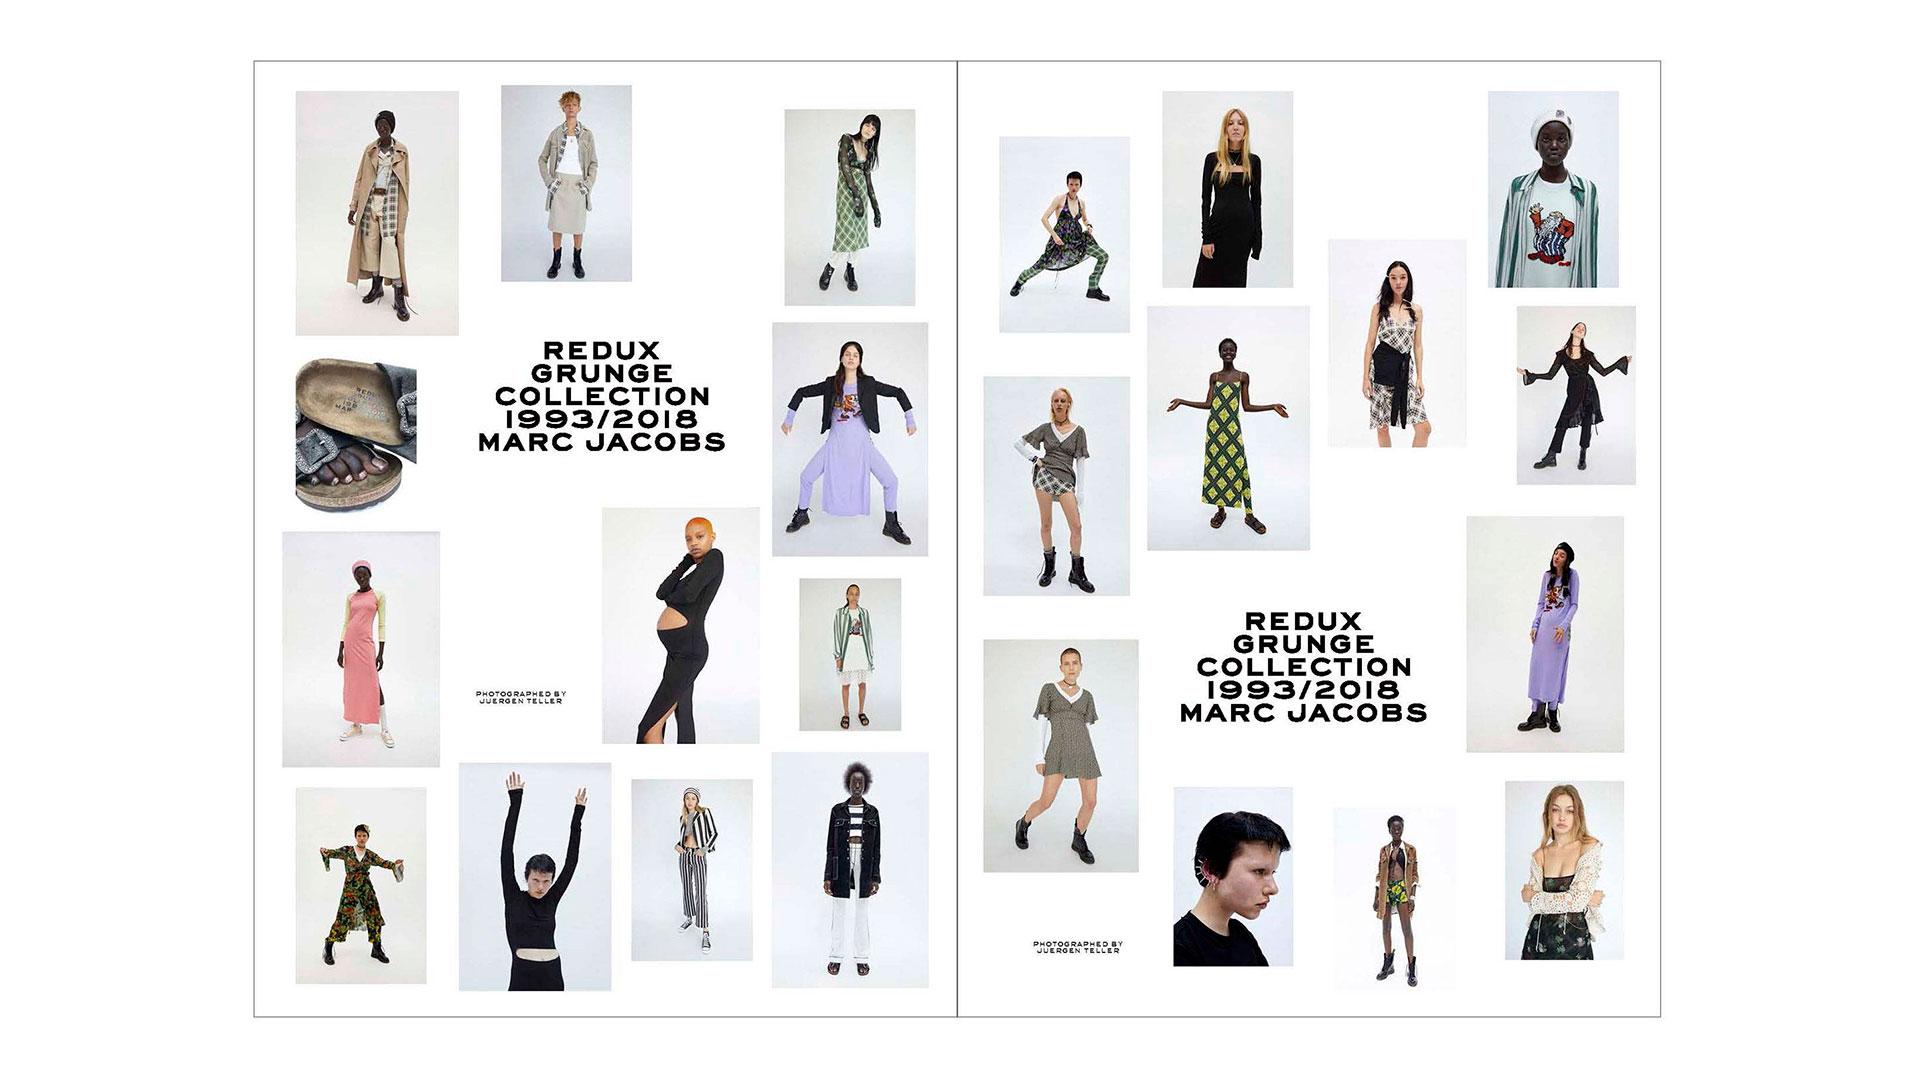 Imagen de la colección Redux Grunge de Marc Jacobs